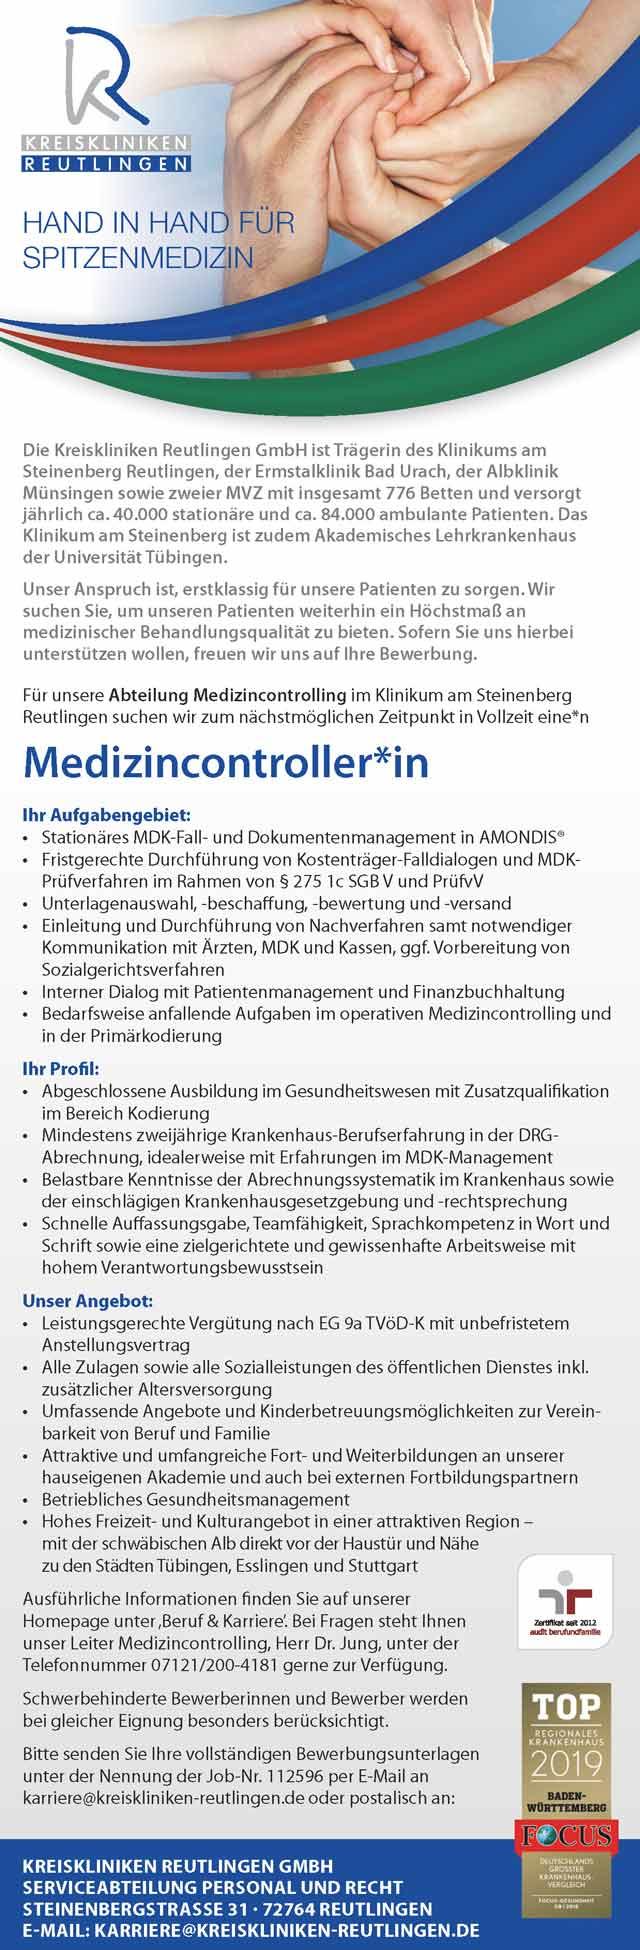 Kreiskliniken Reutlingen GmbH: Medizincontroller (m/w/d)